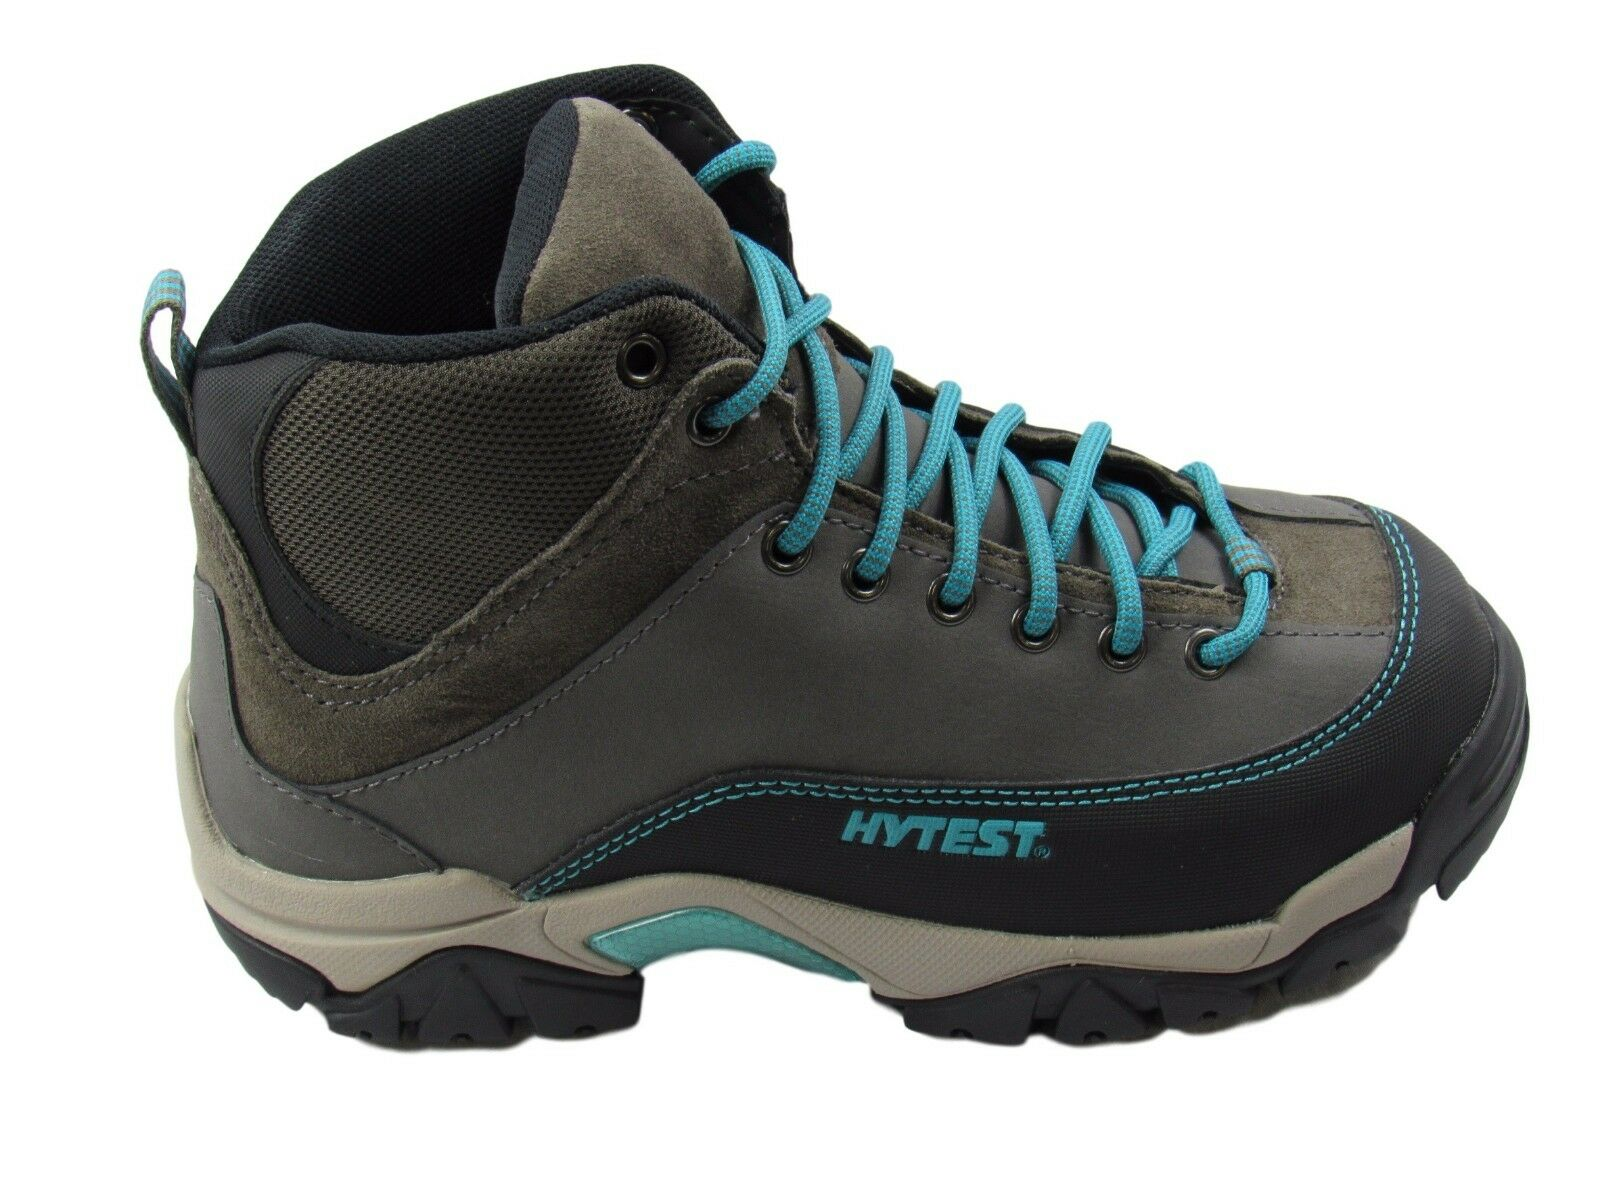 Hytest damen Apex Hiker Steel Toe Safety schuhe Slip and Oil Resistant Sz 6.5 W